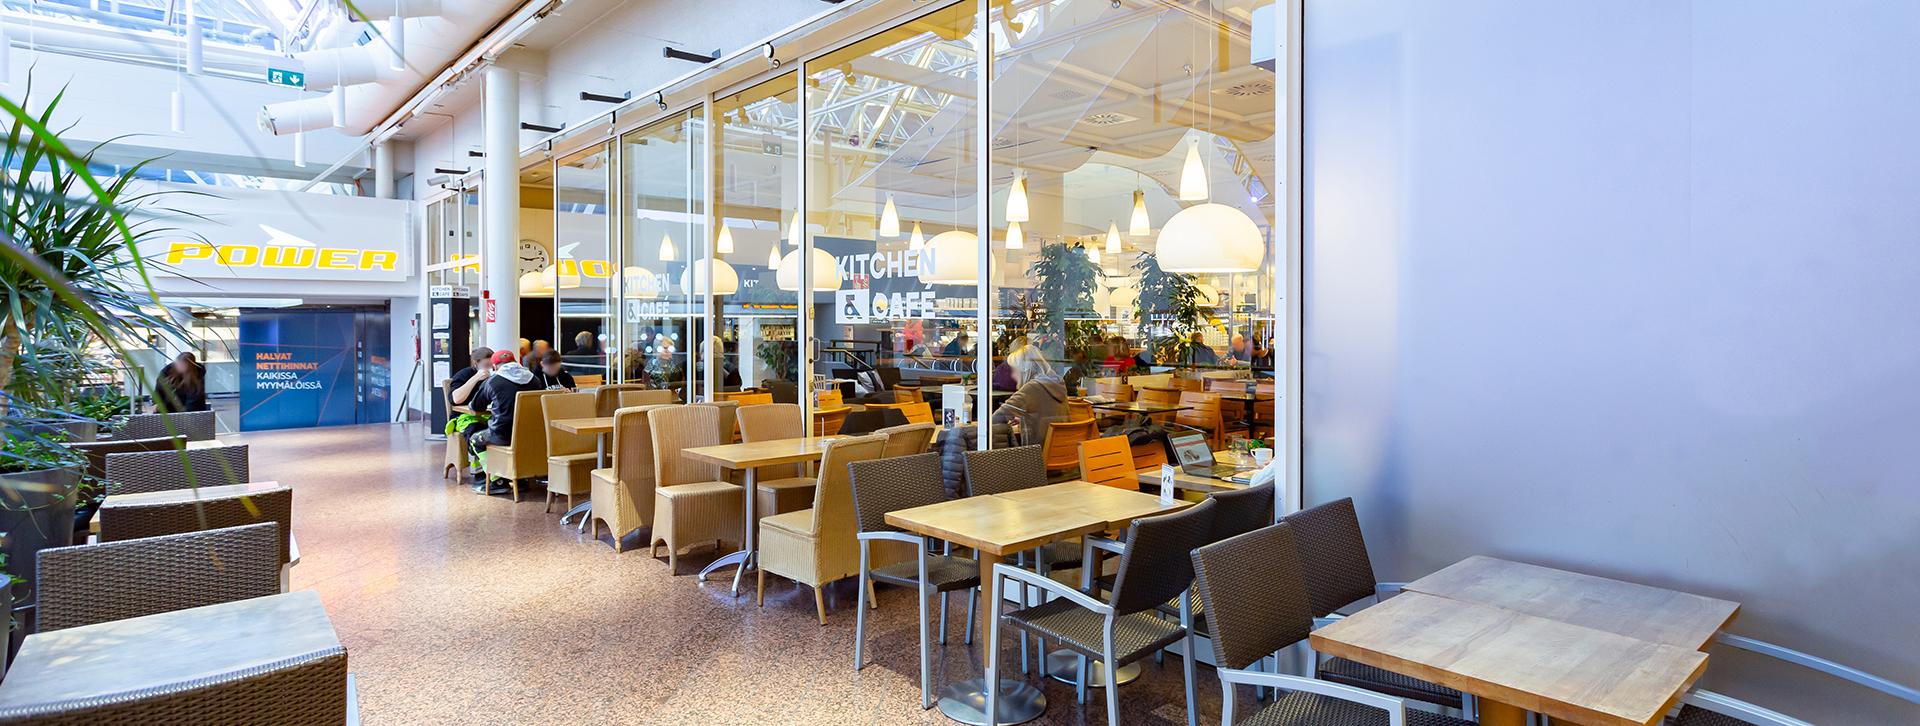 kitchen-cafe-stockmann